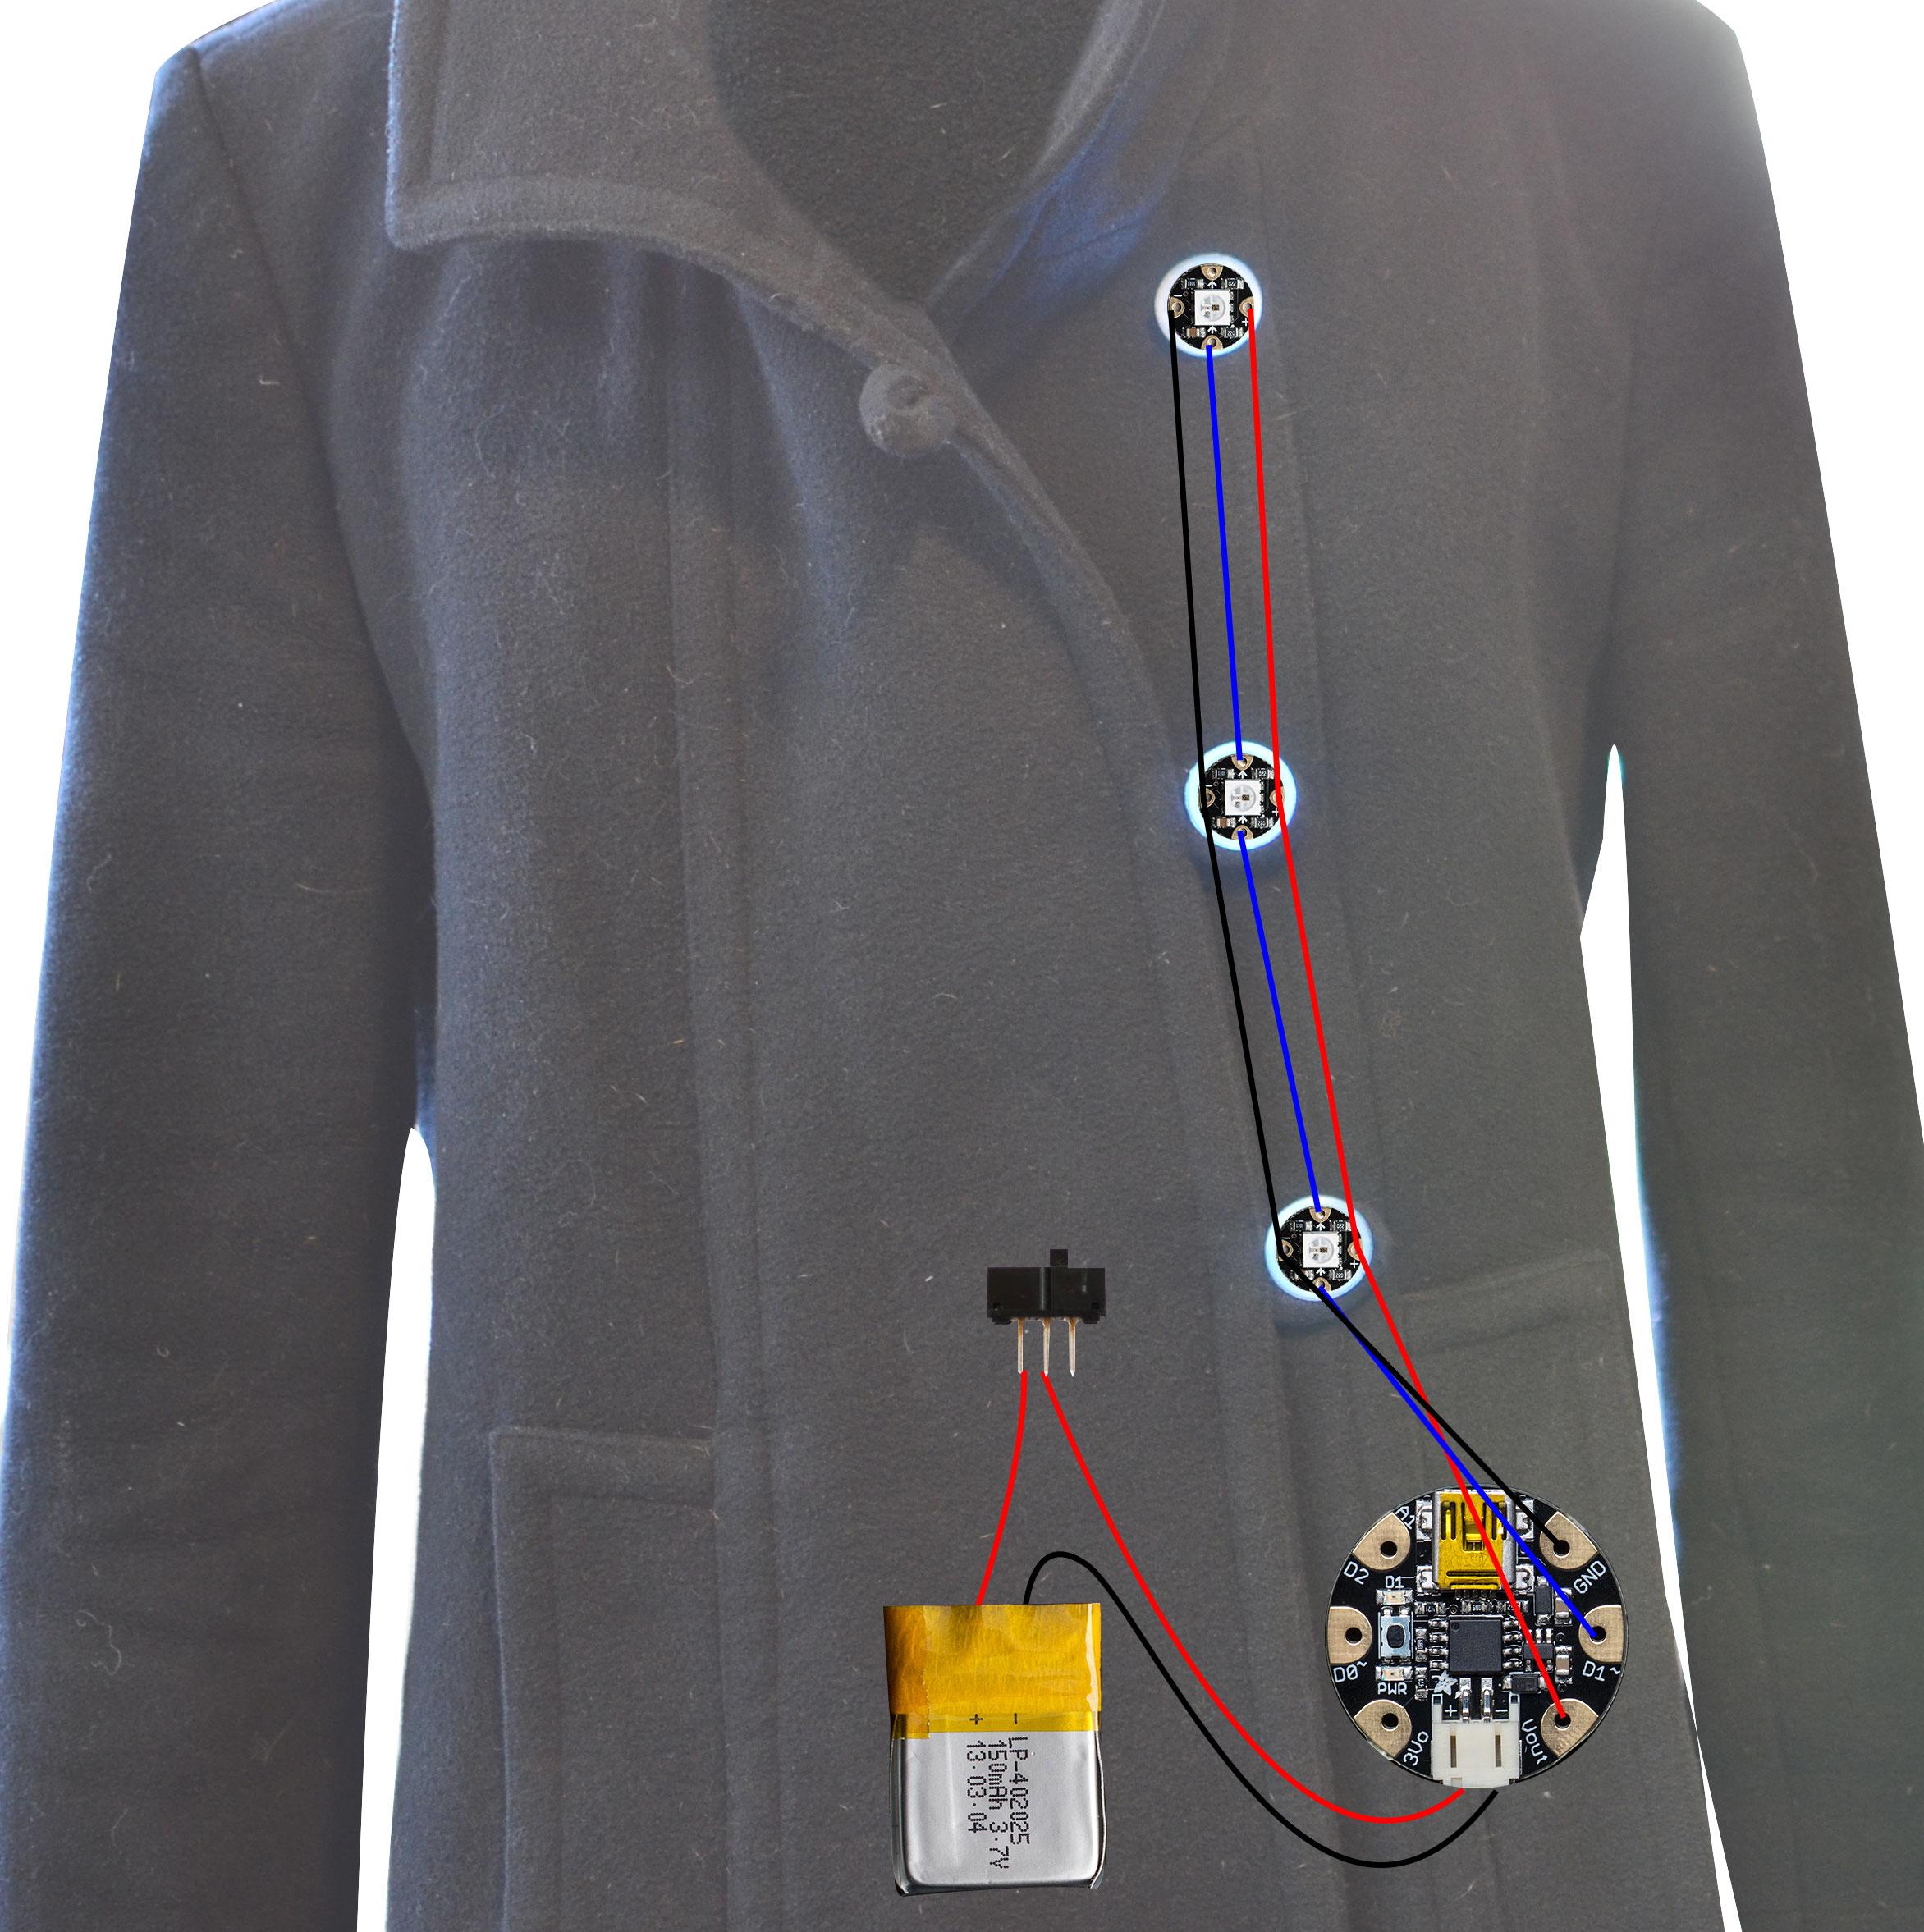 3d_printing_coat-bnt-curcuit-layout.jpg